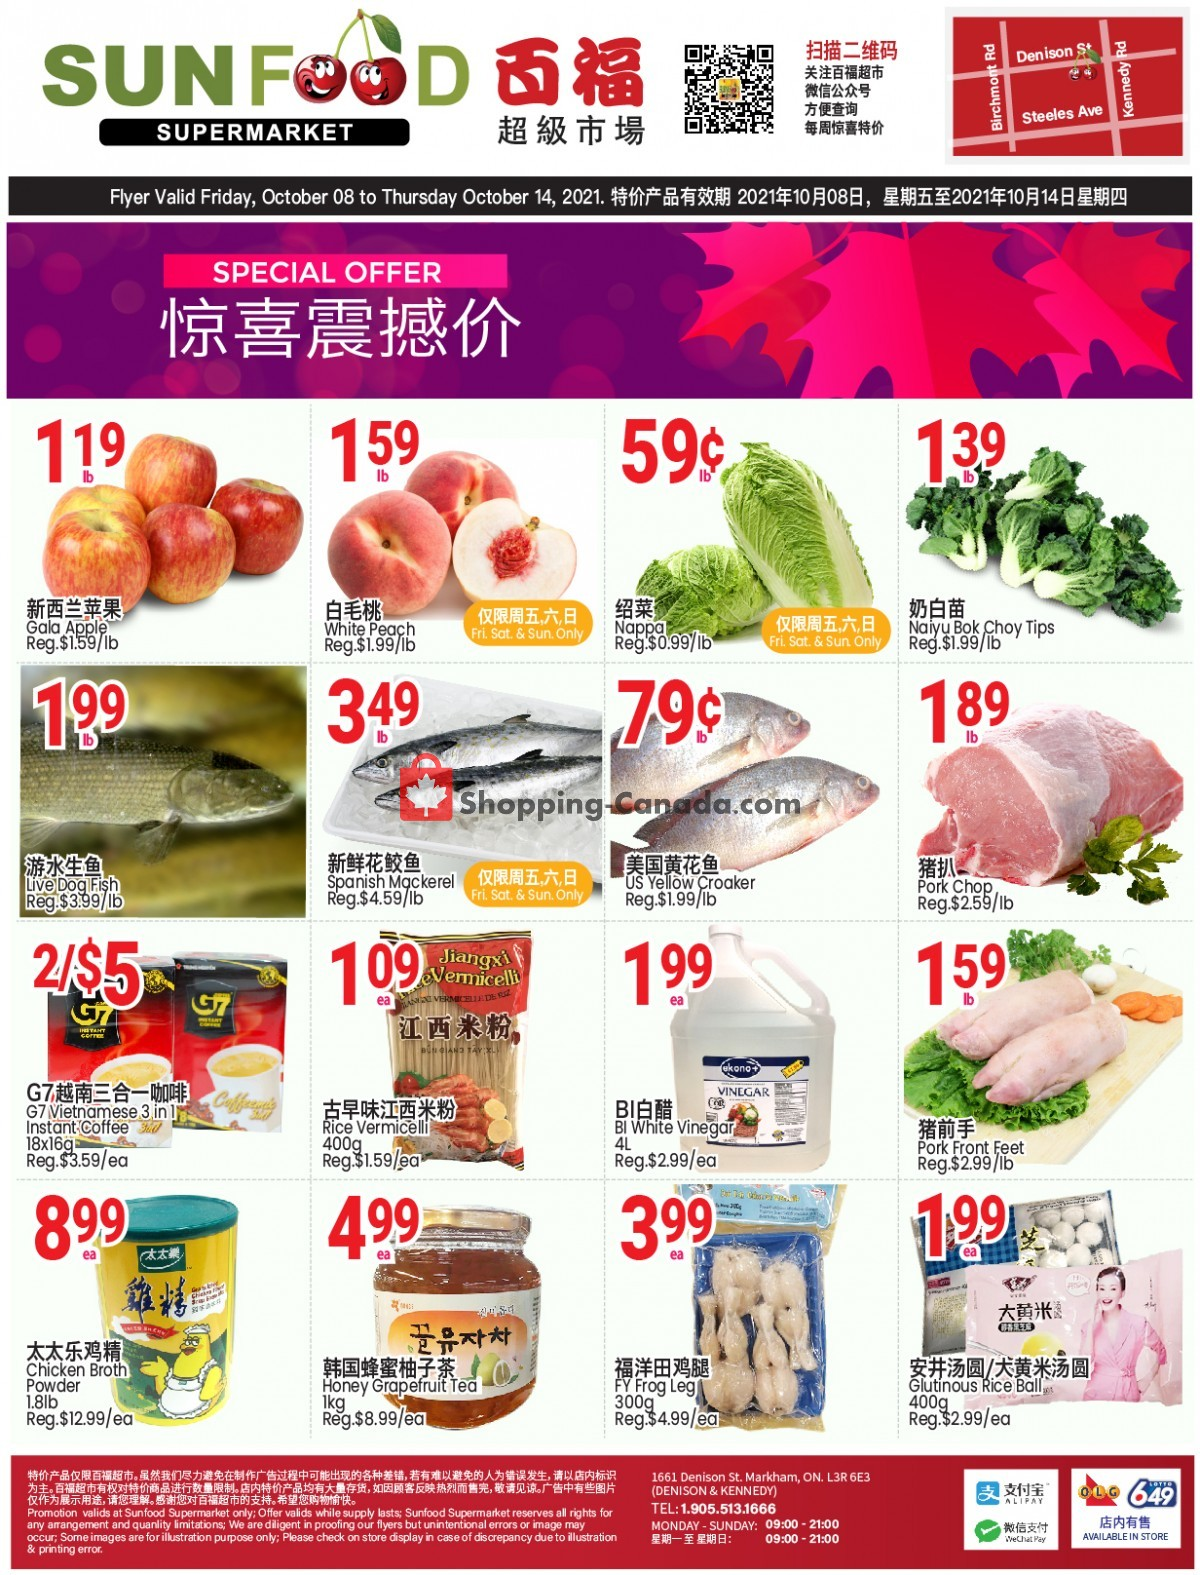 Flyer Sunfood Supermarket Canada - from Friday October 8, 2021 to Thursday October 14, 2021